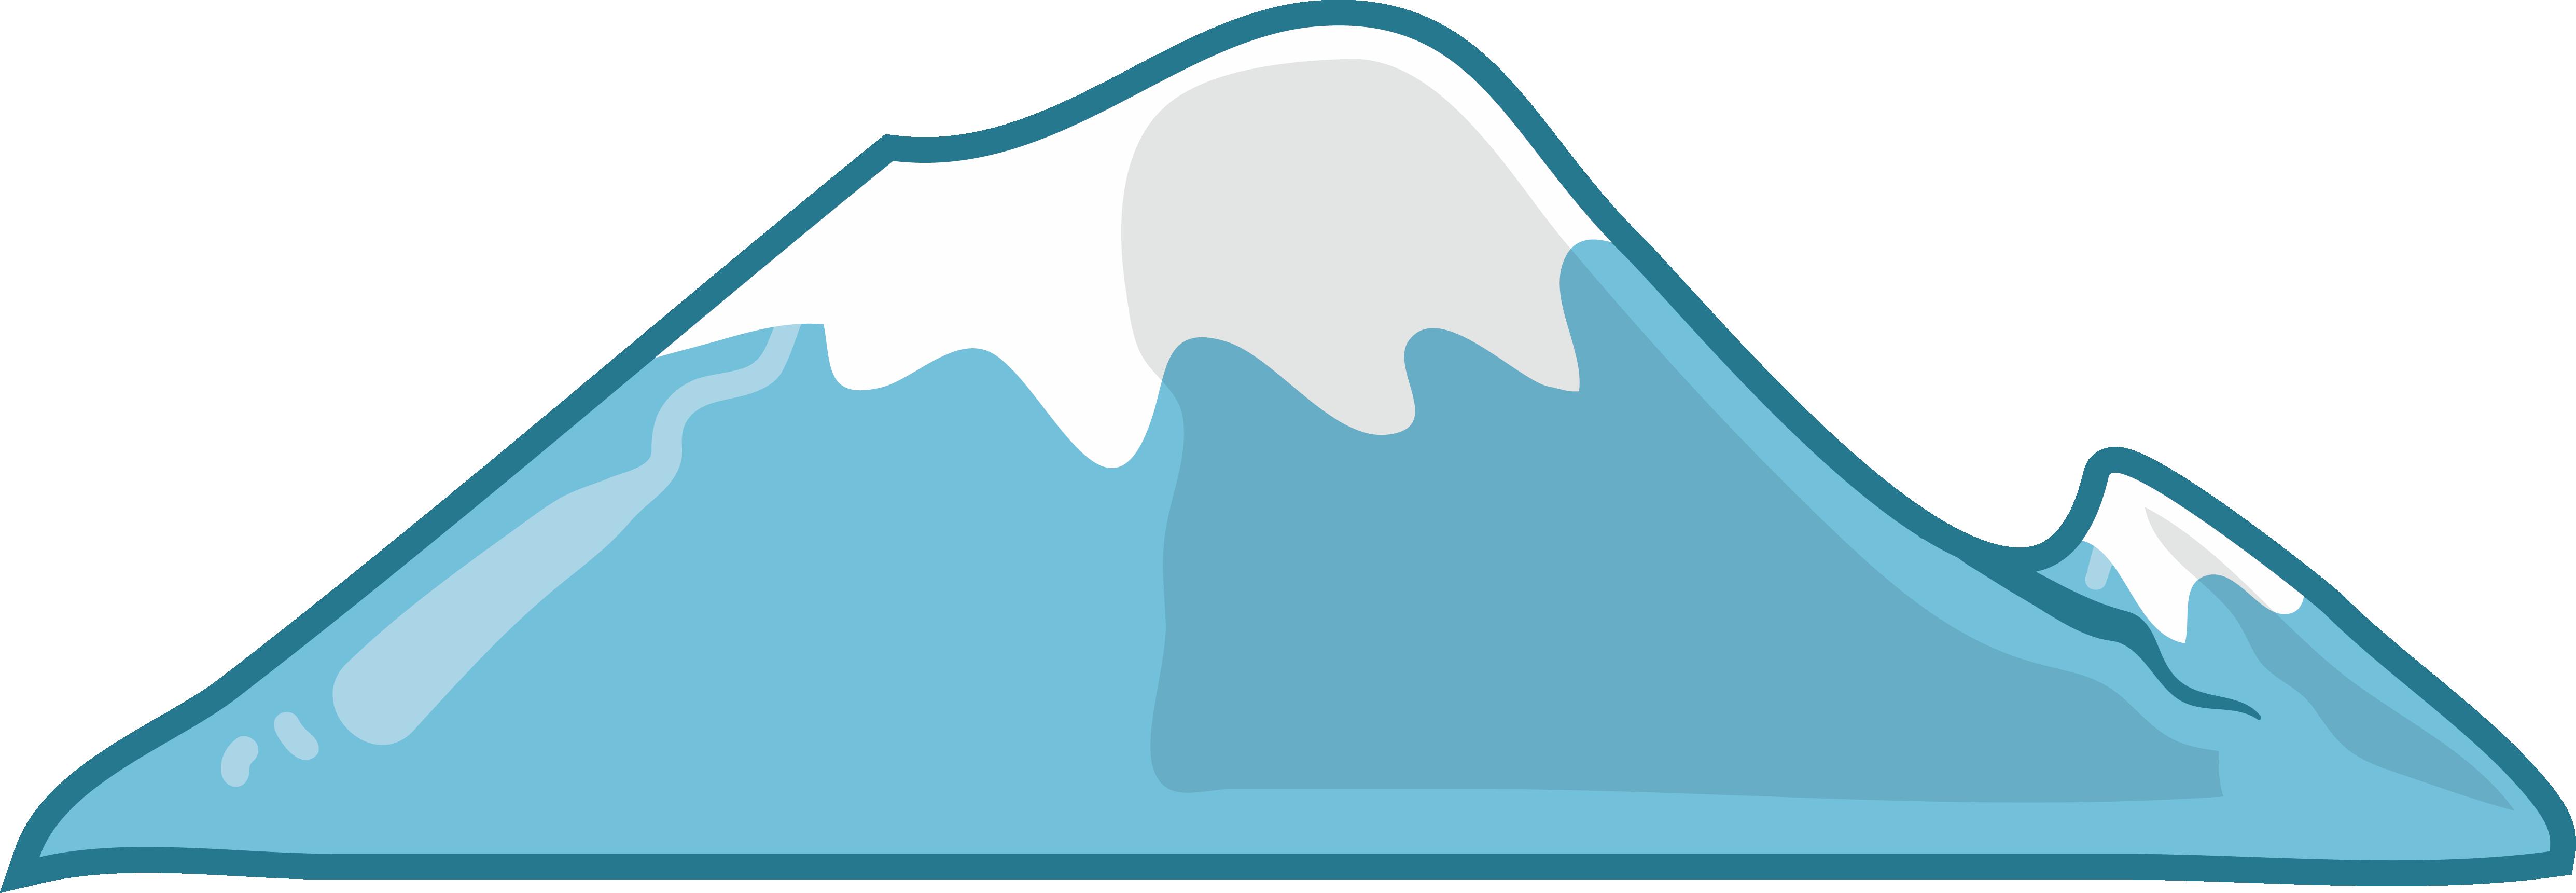 clip transparent download Drawing snow mountain. Cartoon blue top transprent